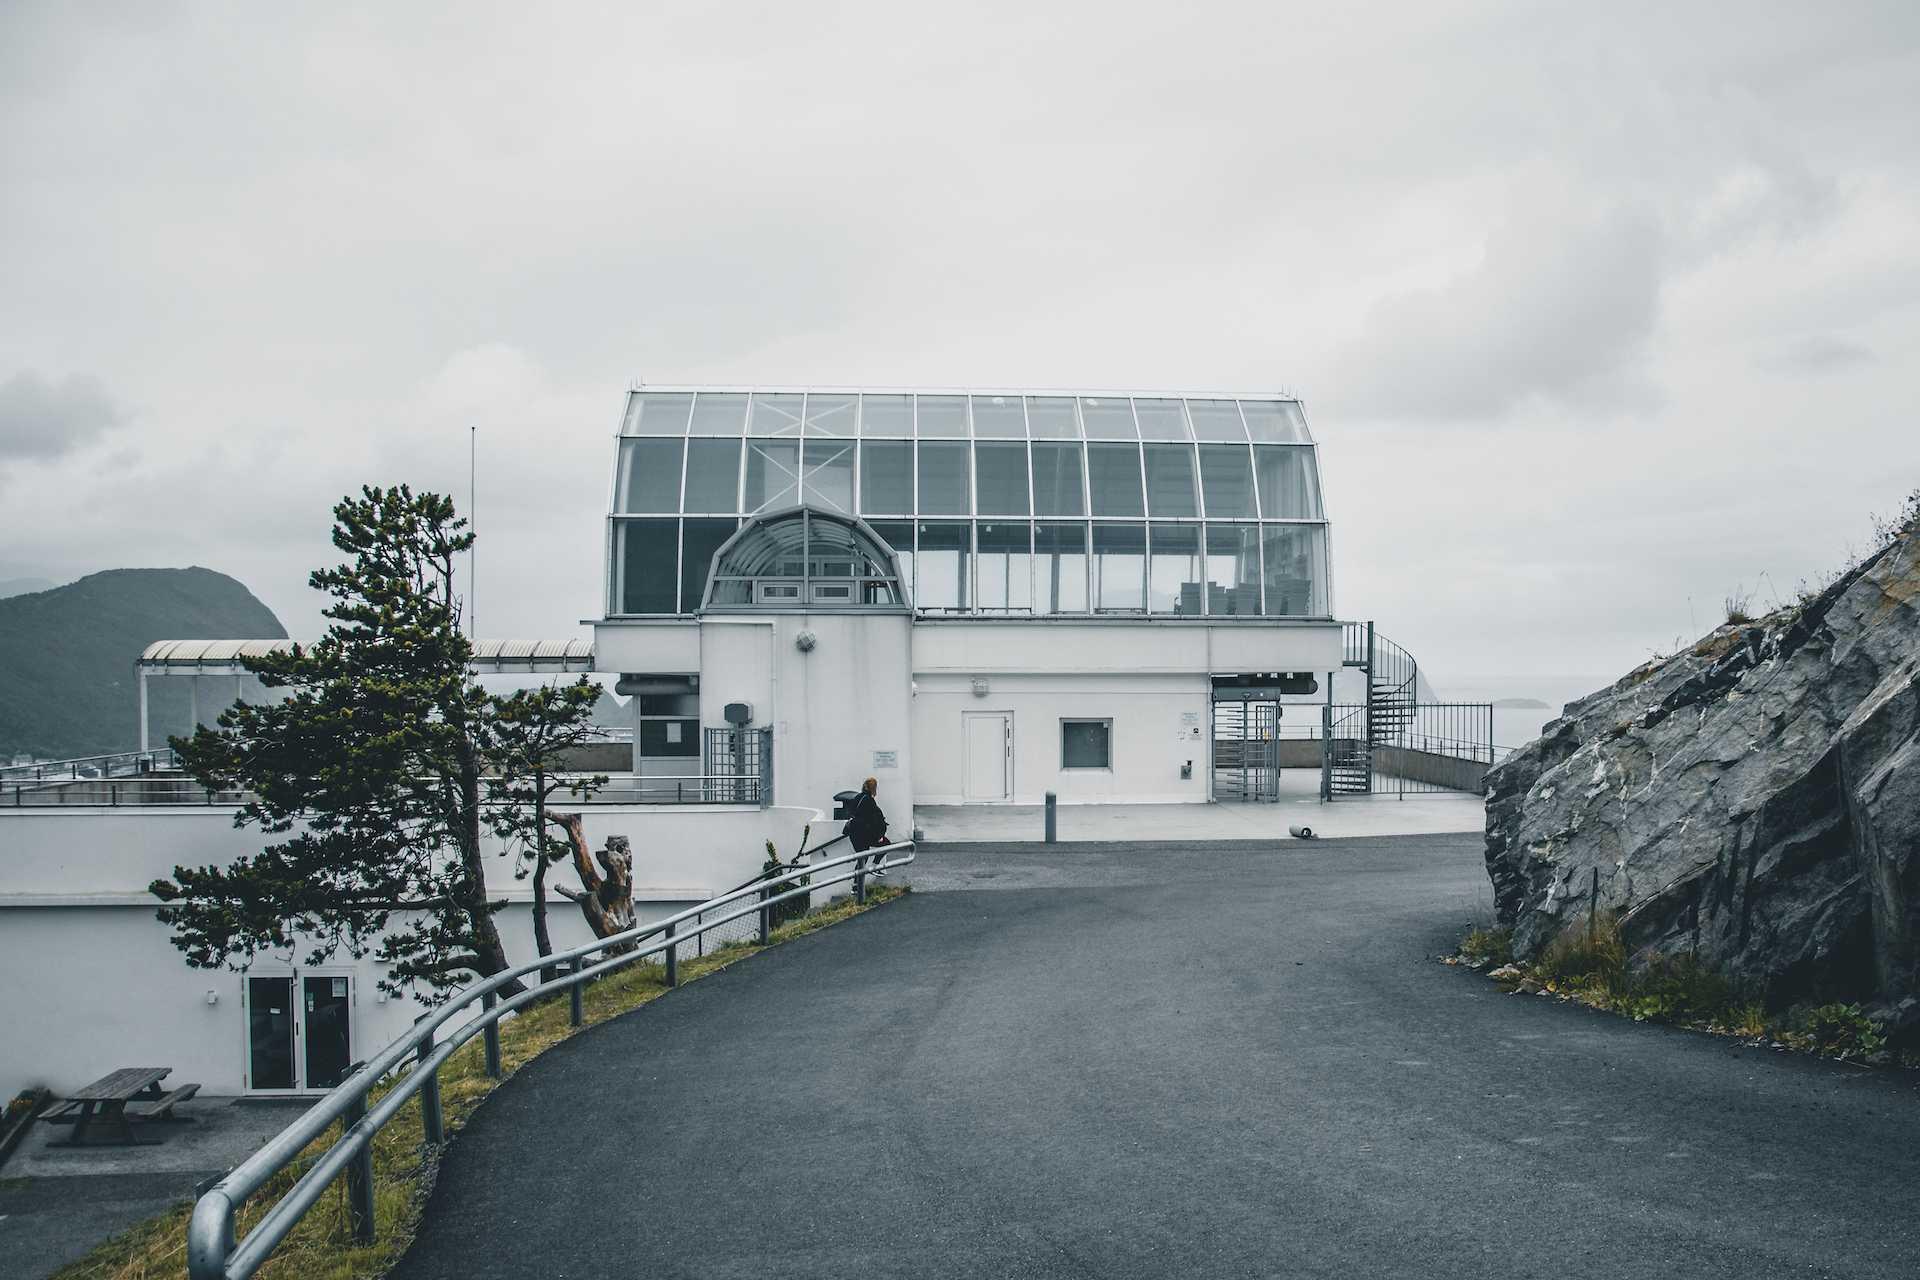 restauracja Ålseund